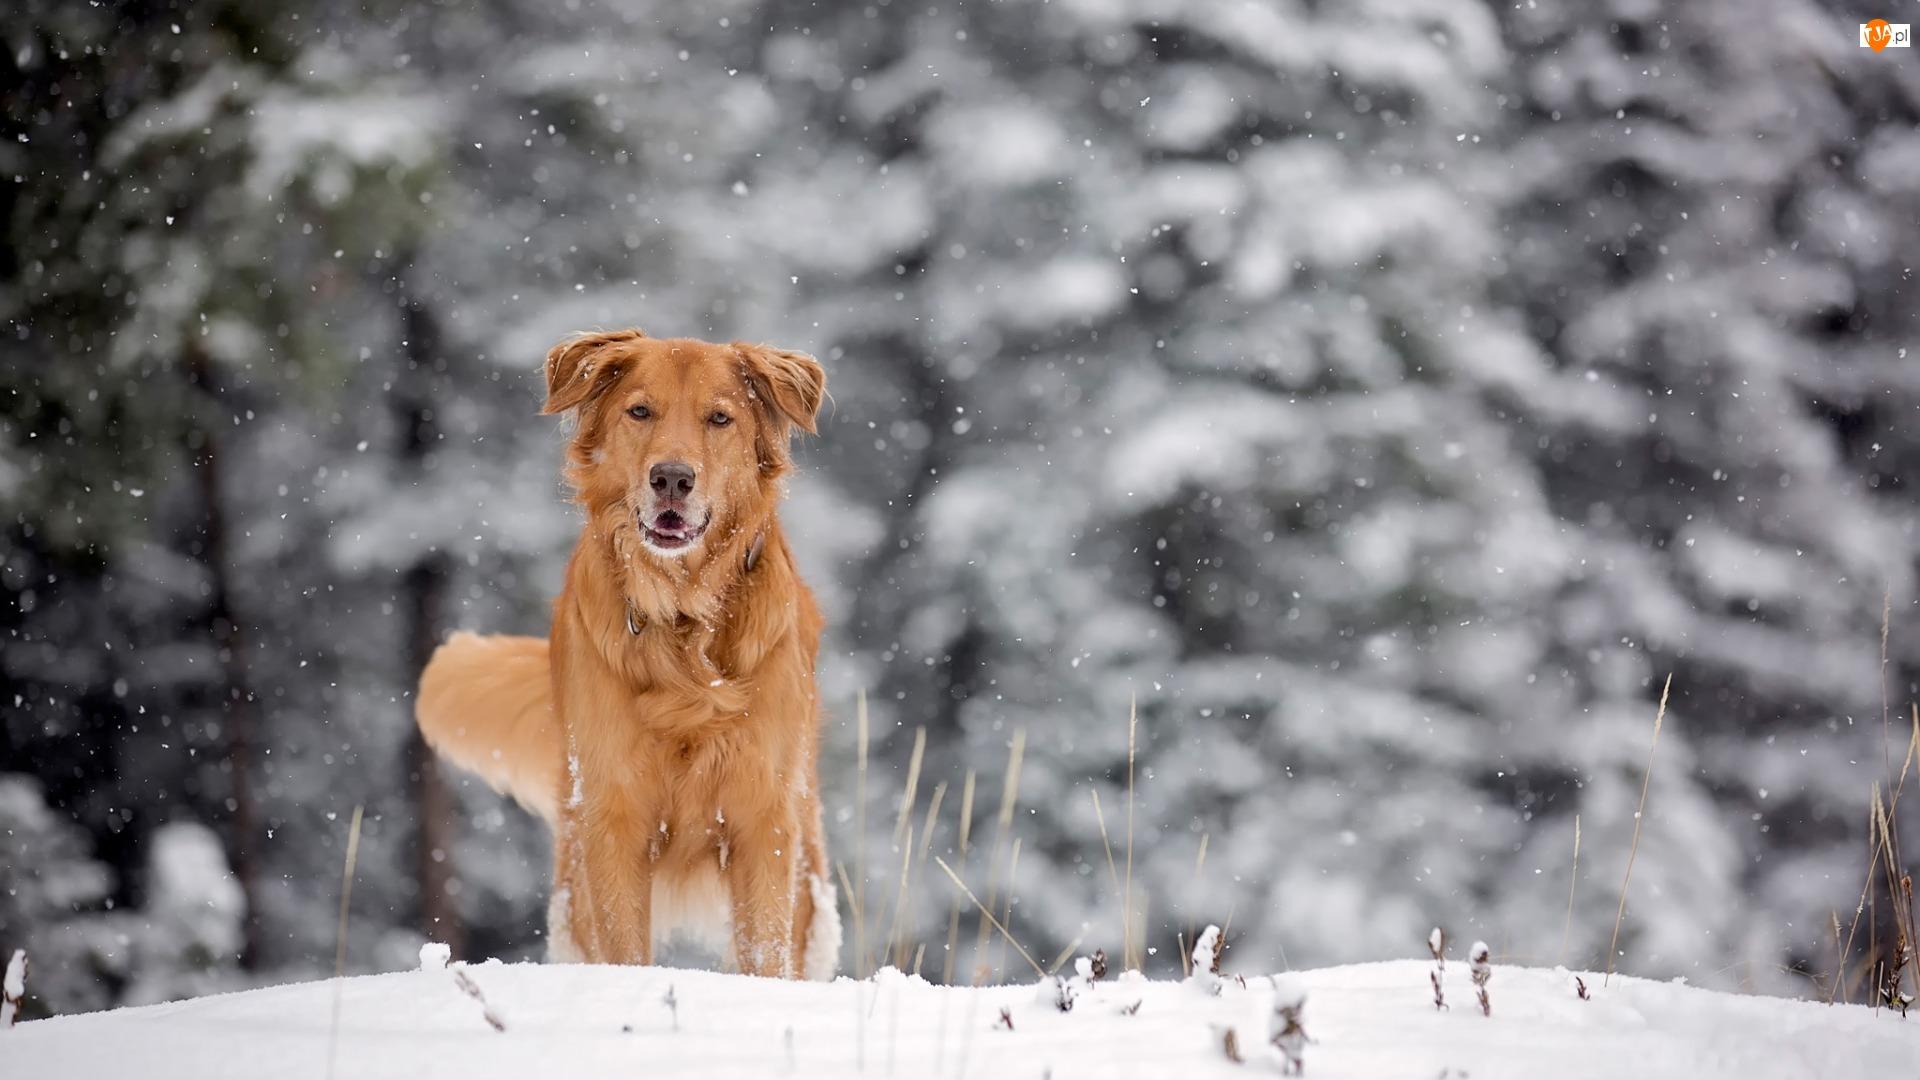 Rudy, Śnieg, Pies, Zima